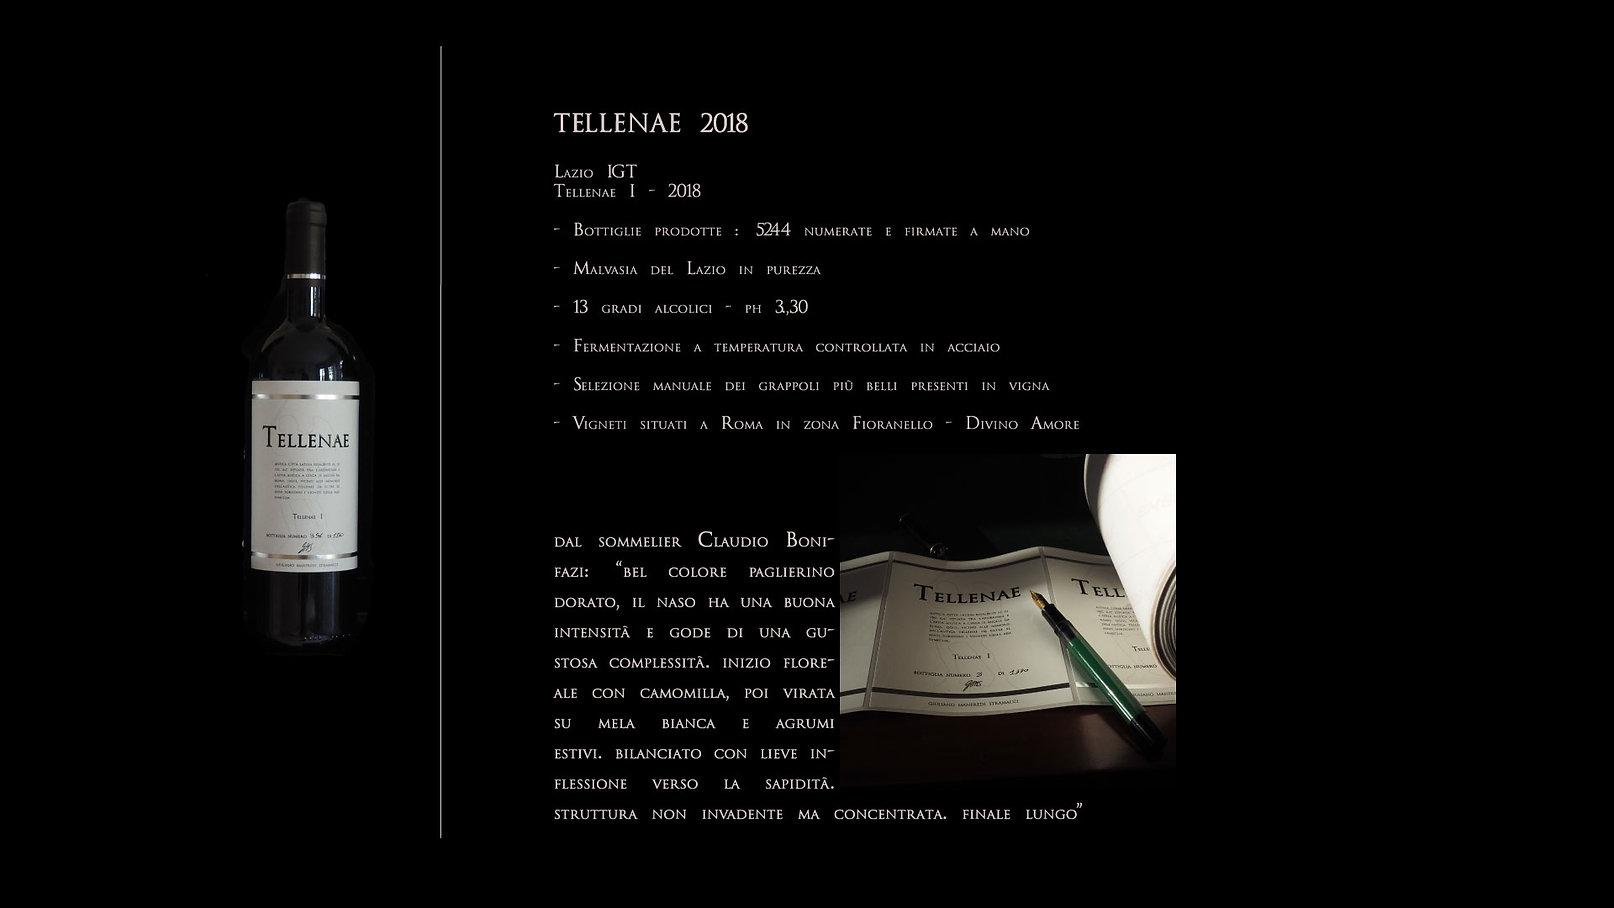 TELLENAE2018.jpg